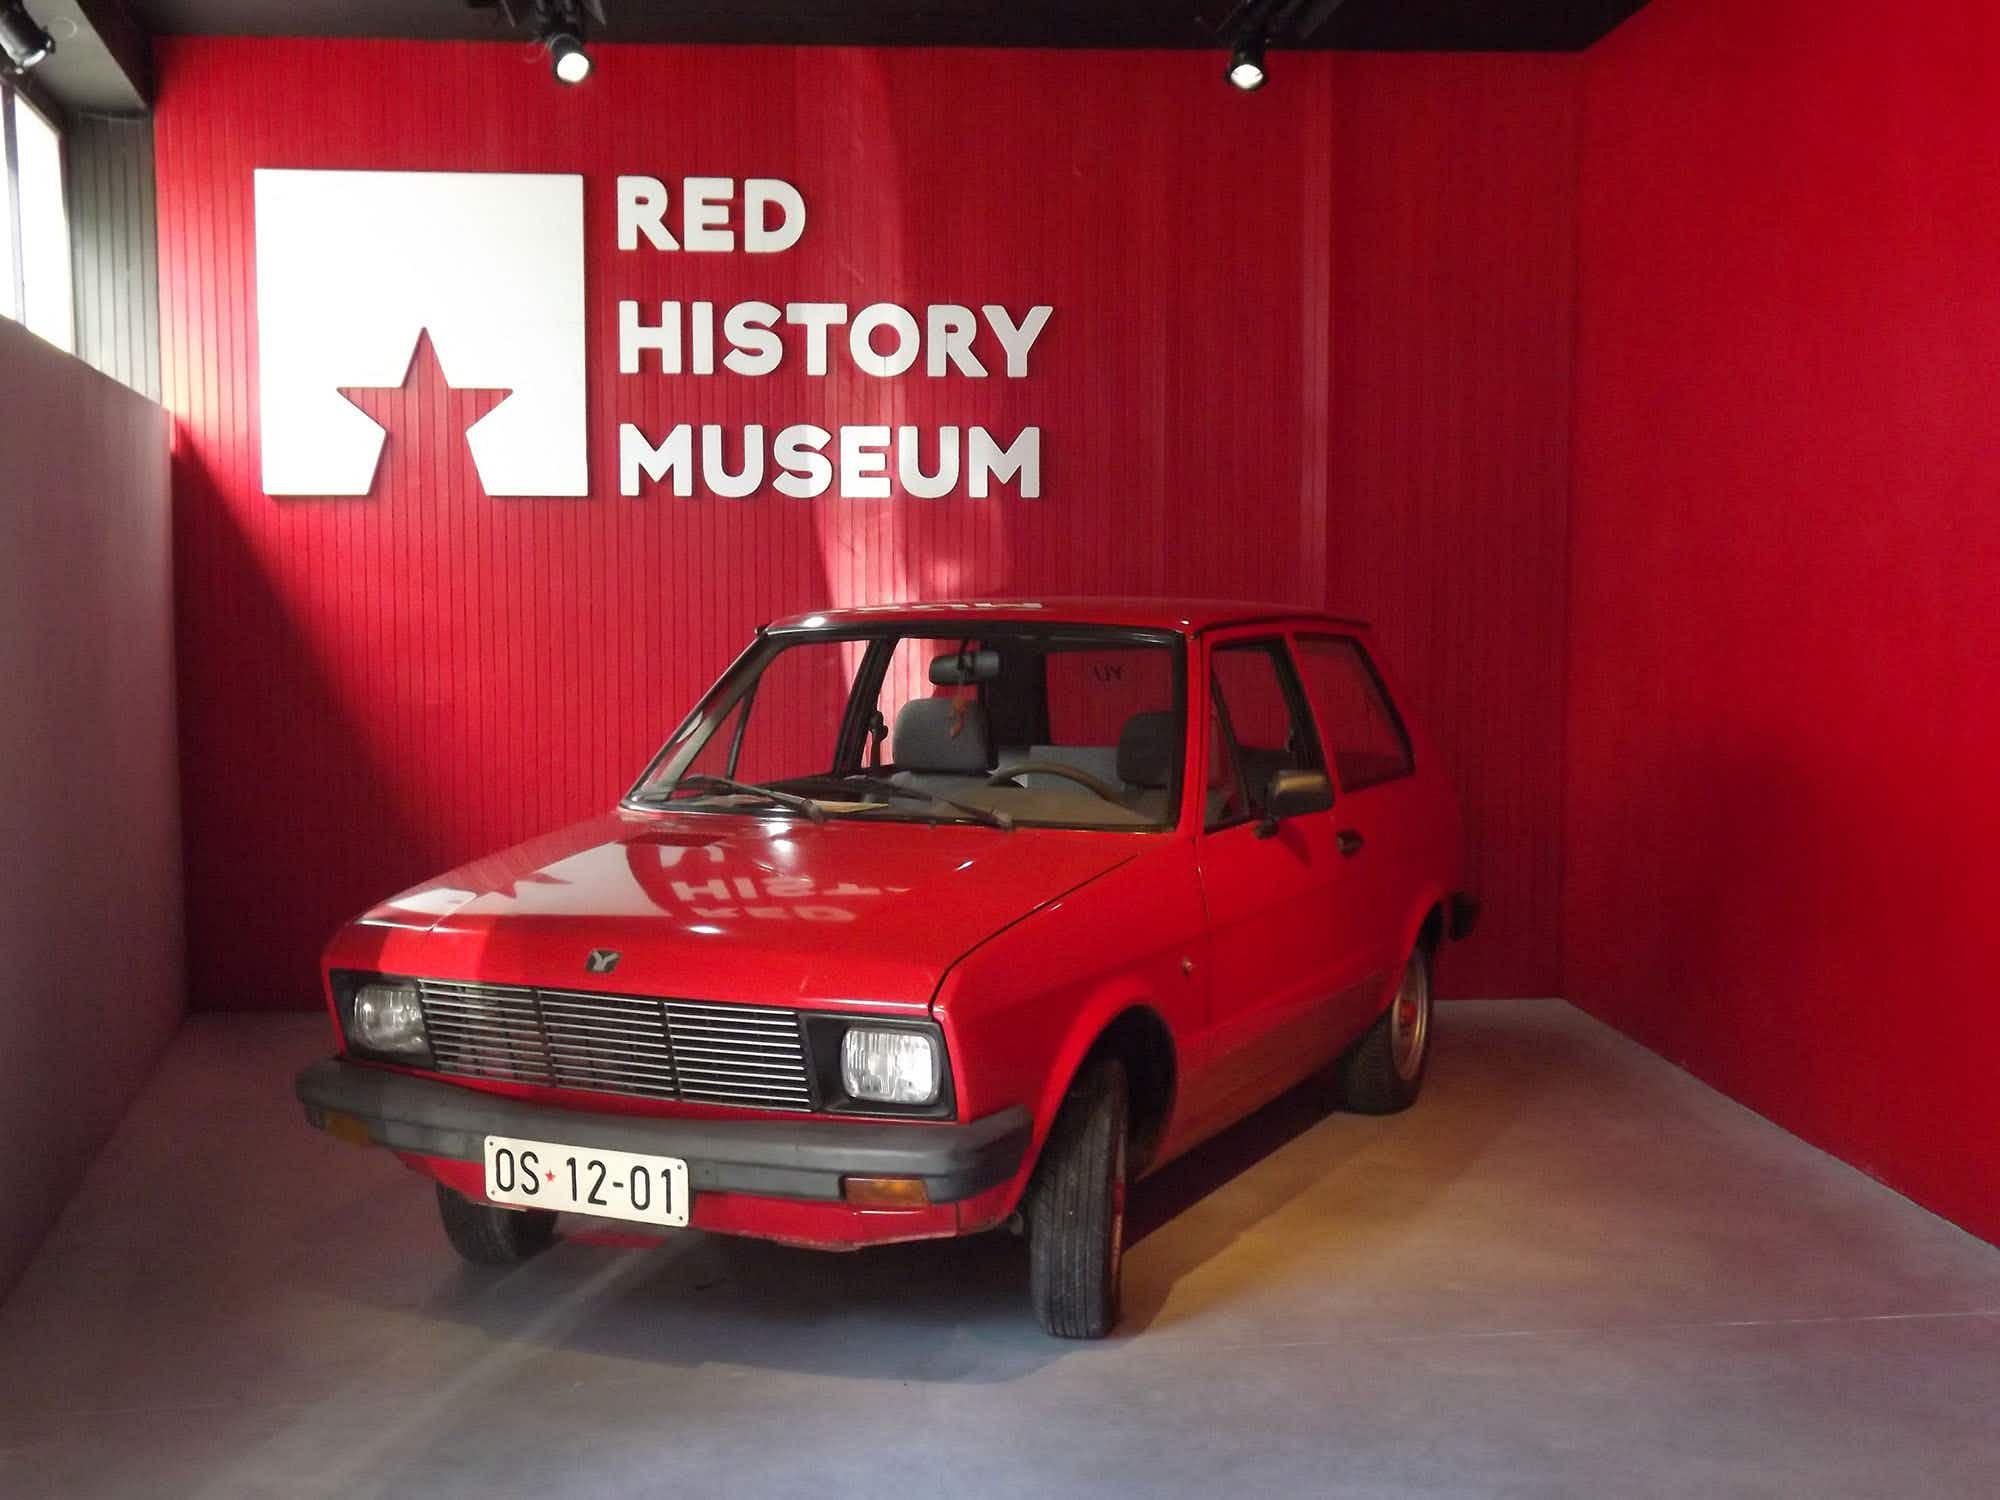 Dubrovnik's Red History Museum highlights Croatia's communist history